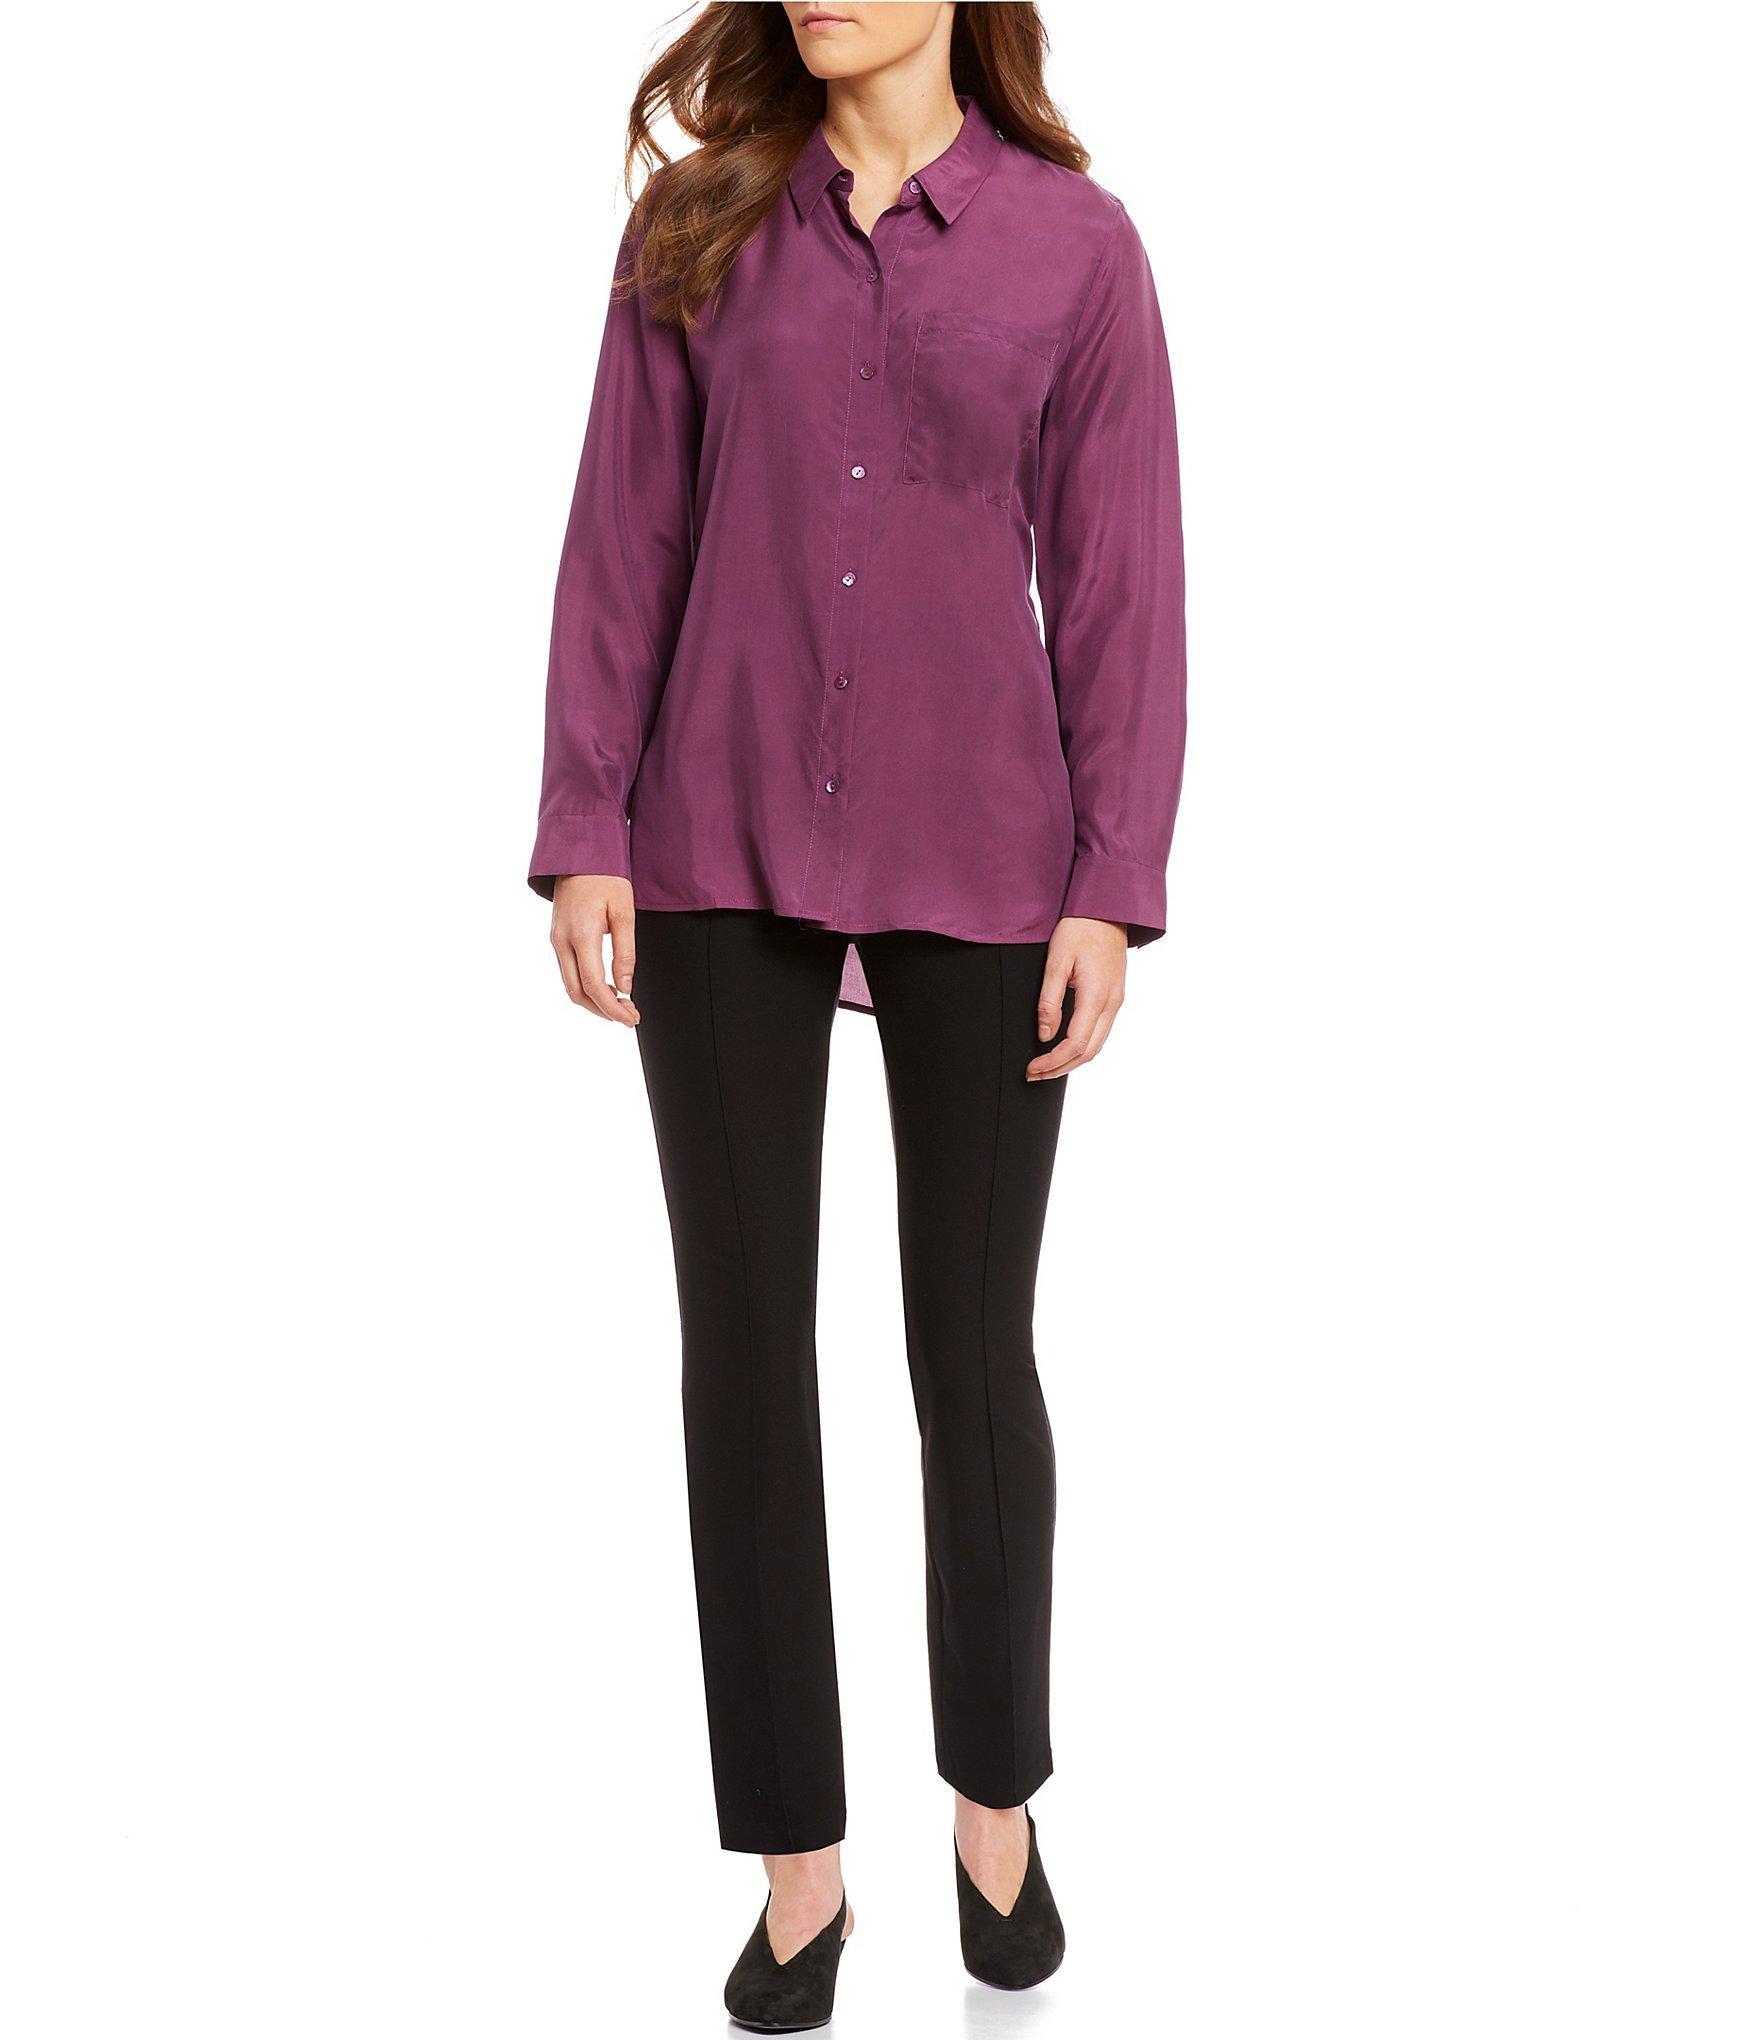 9207431c65b0e9 Lyst - Eileen Fisher Classic Collar Silk Button Front Tunic in Purple